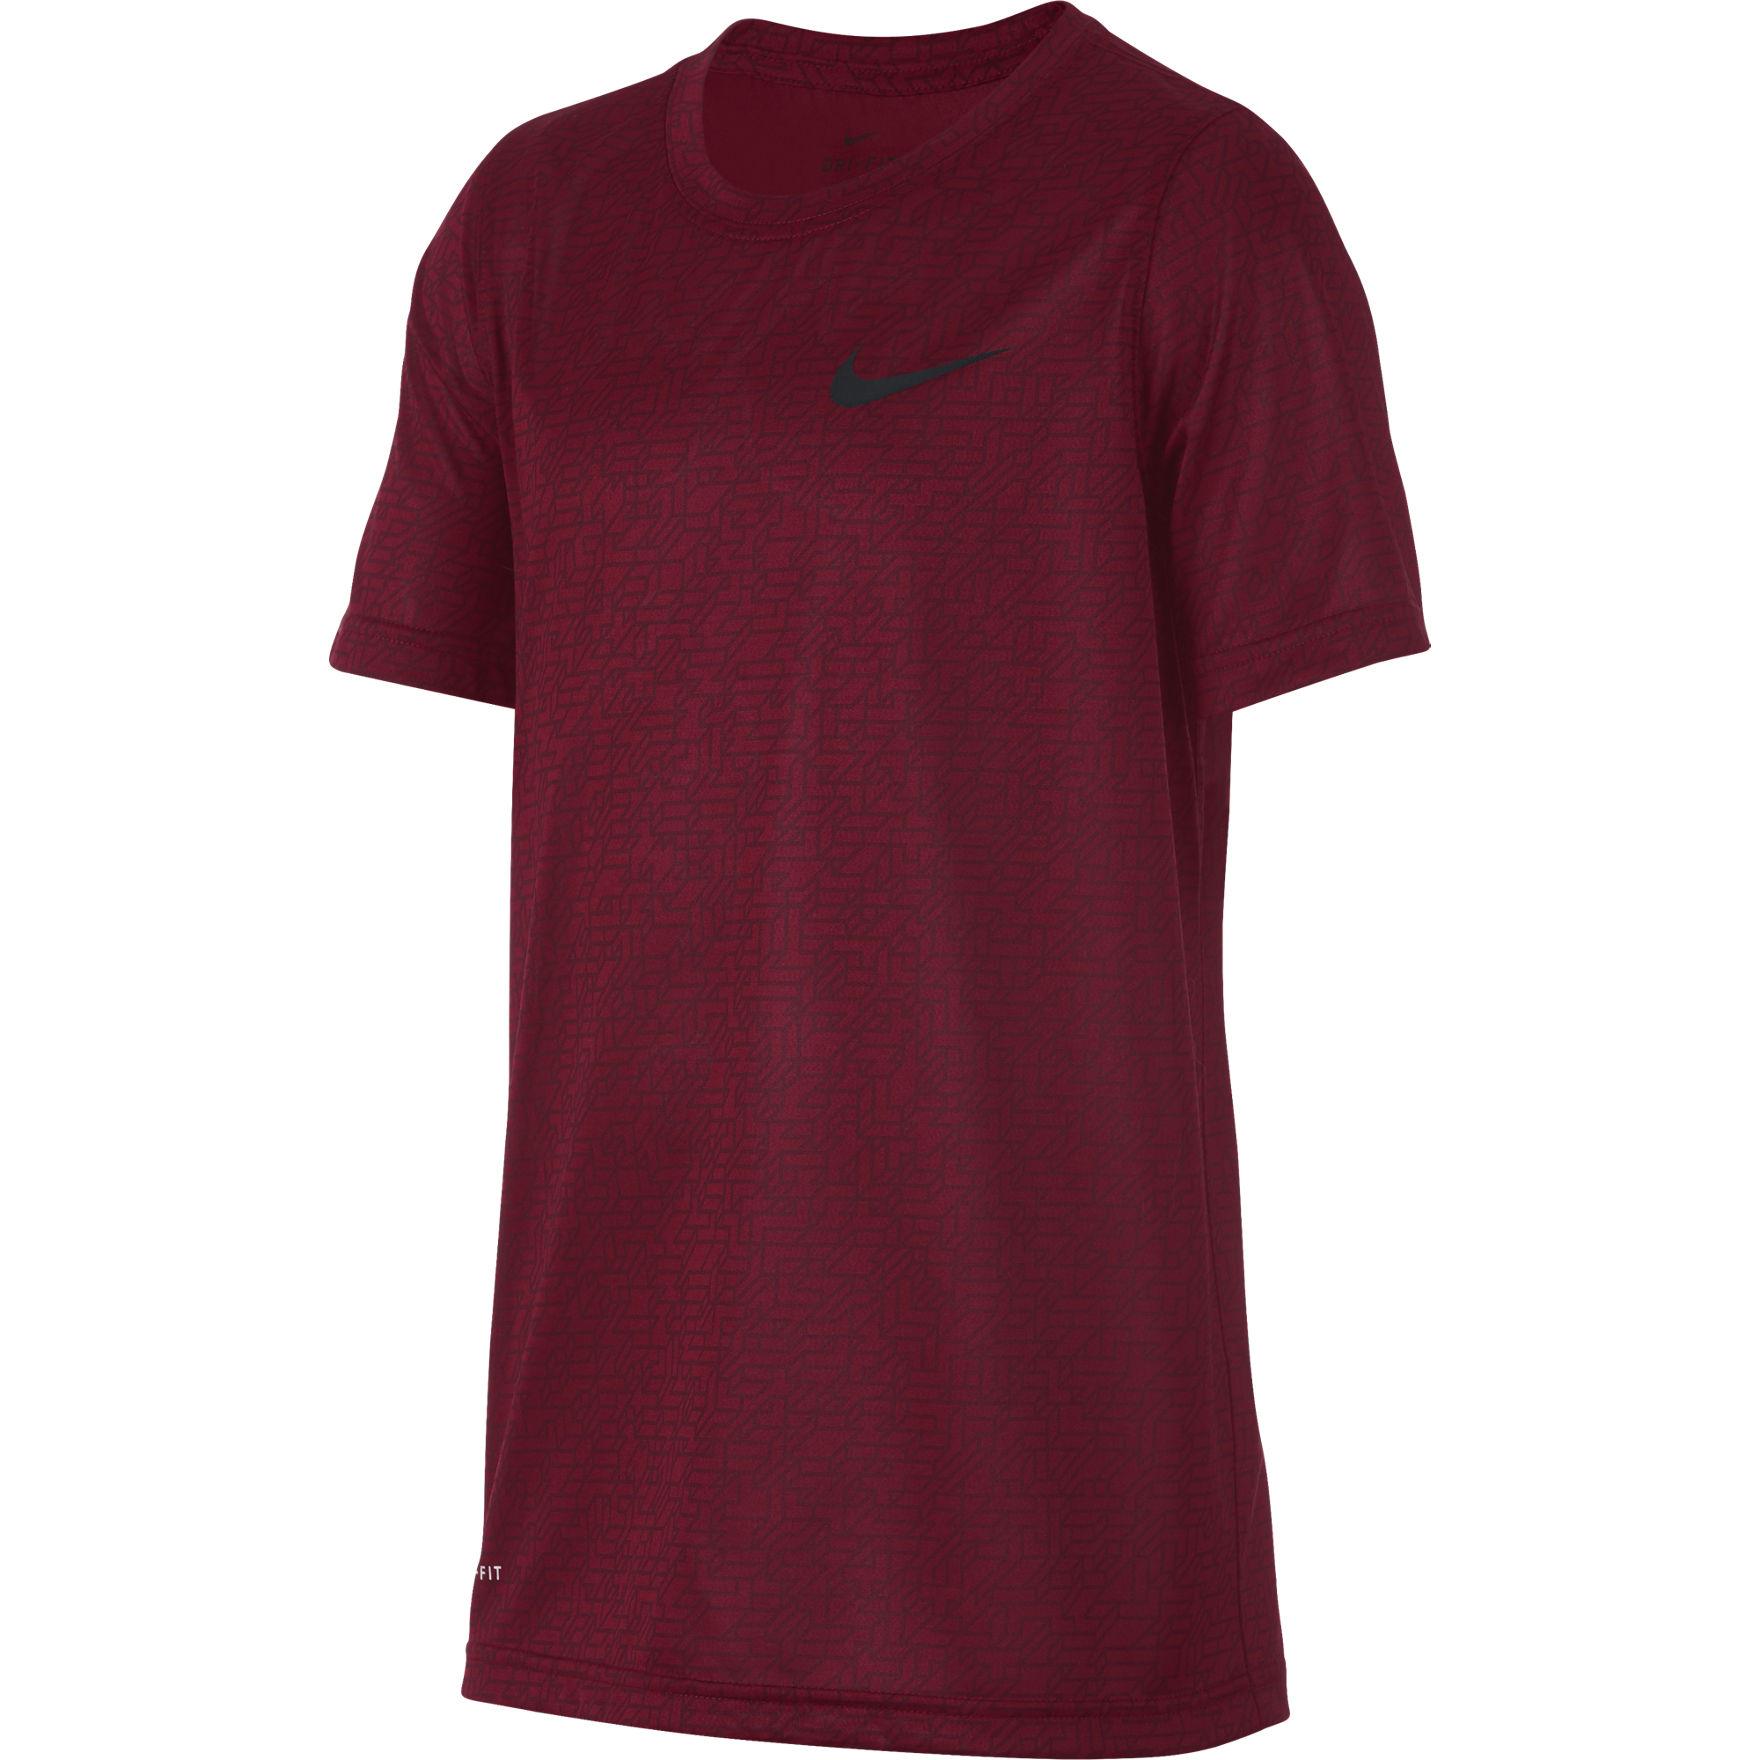 Nike Burgundy Tees & Tanks